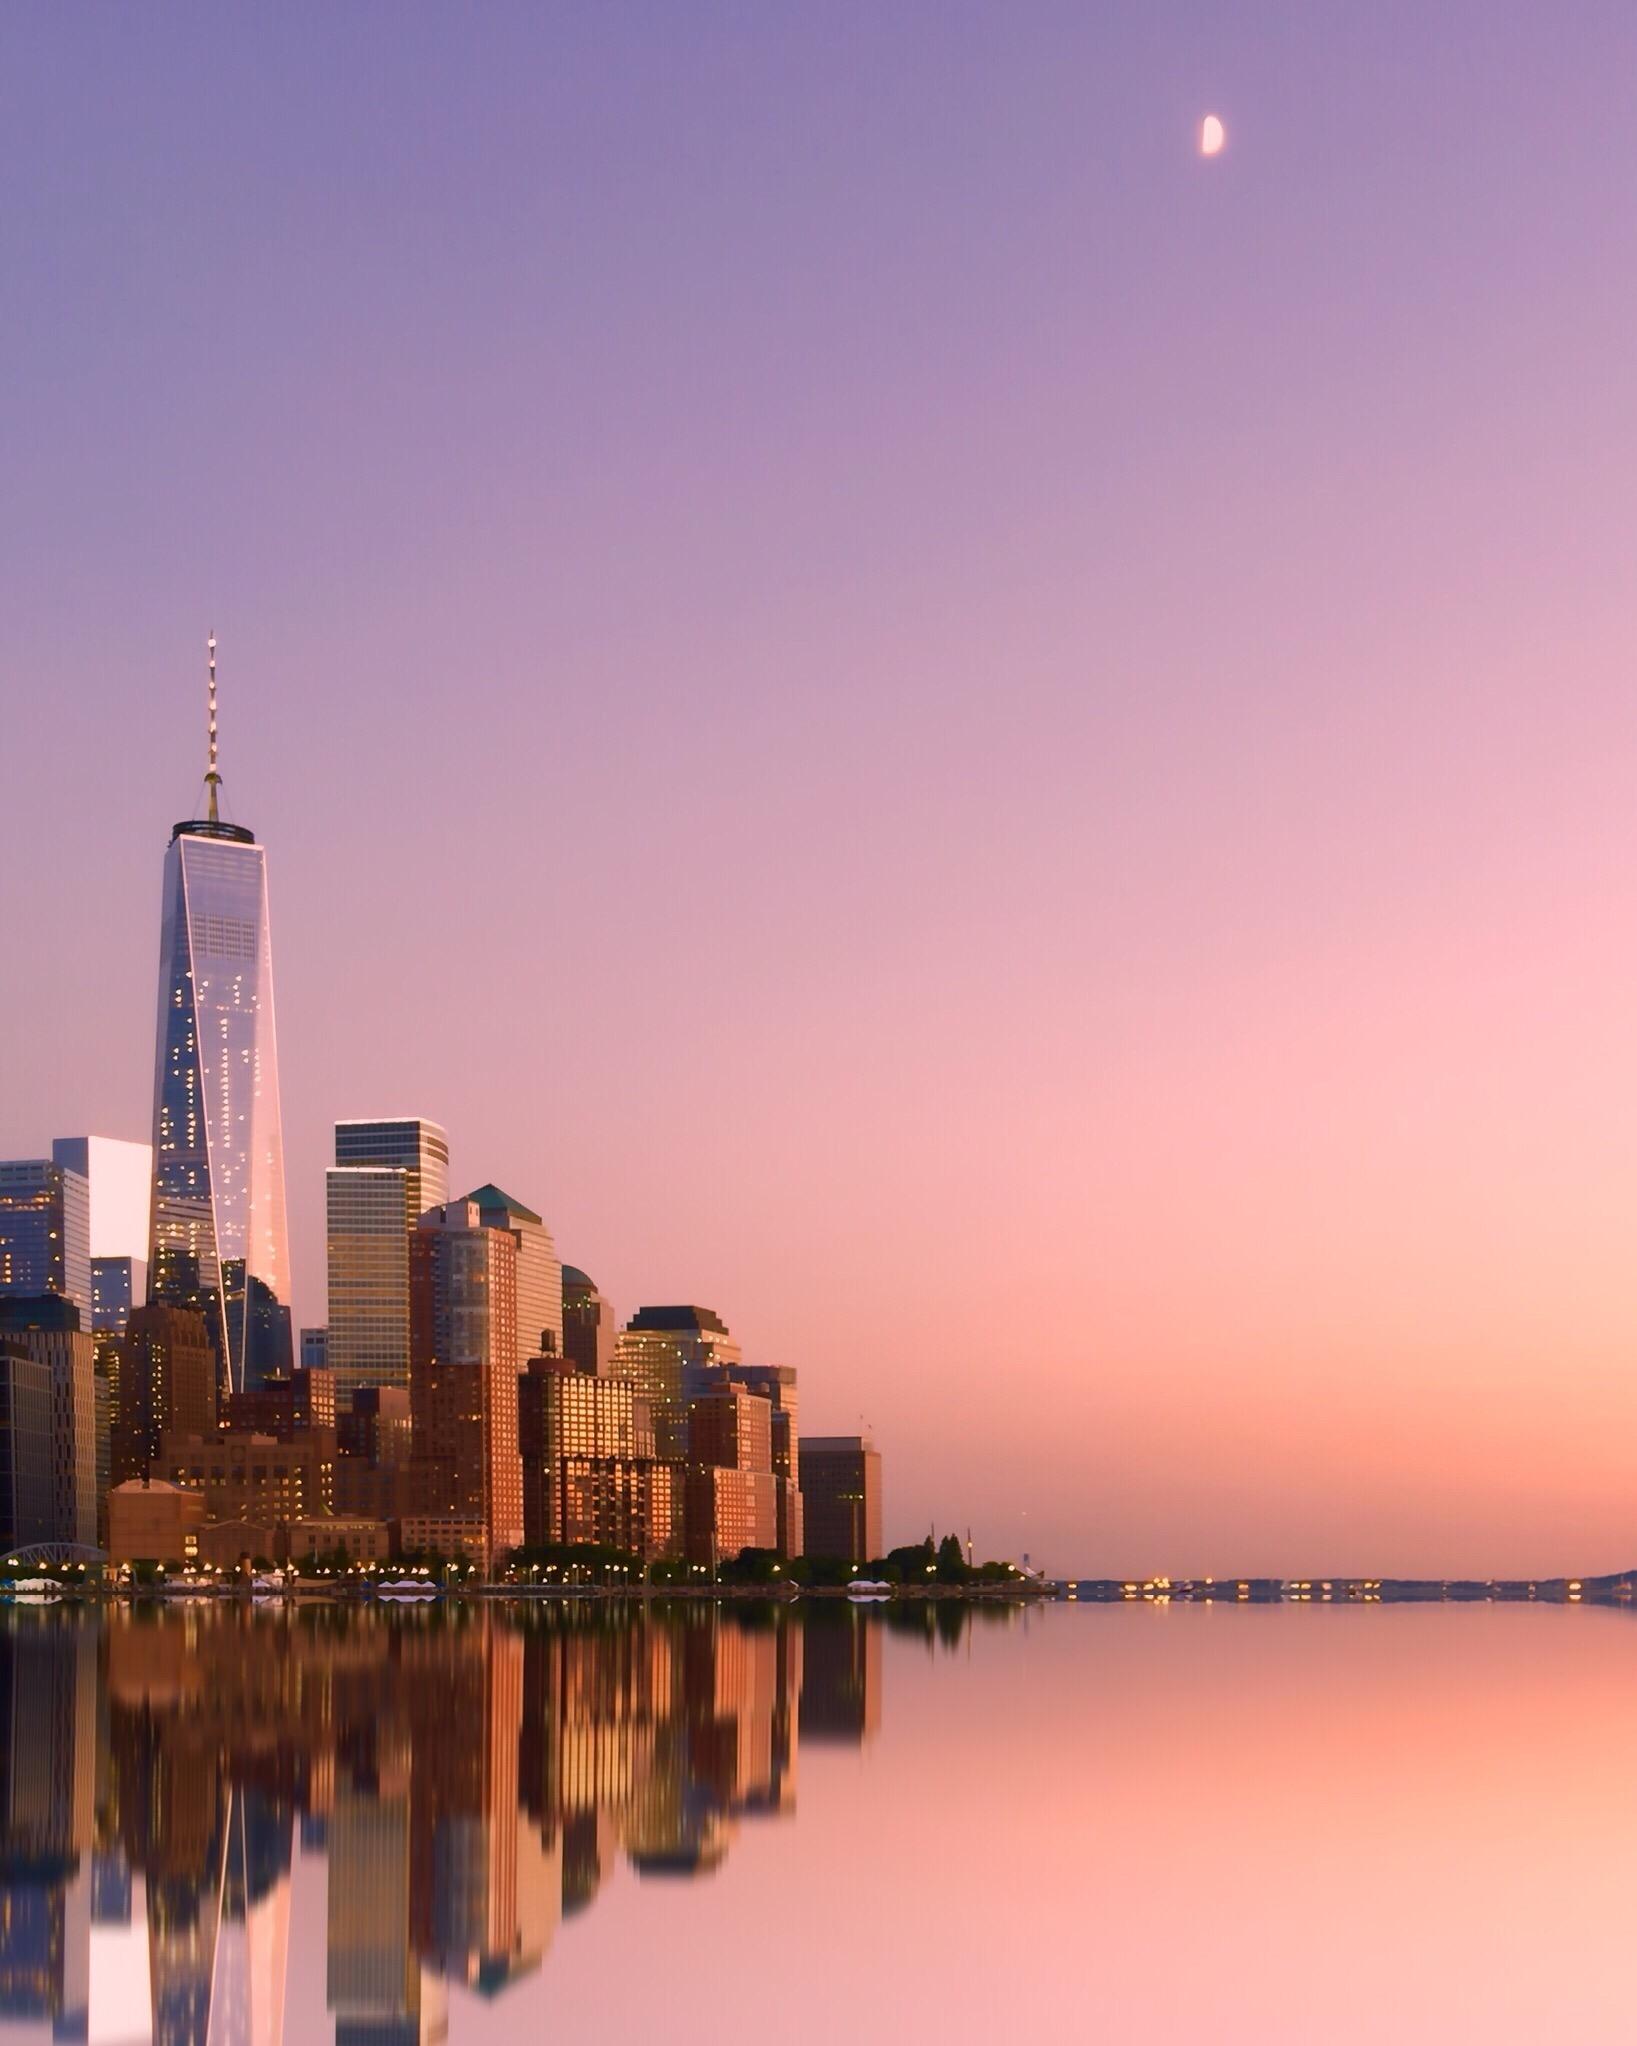 sunset-new-york-city